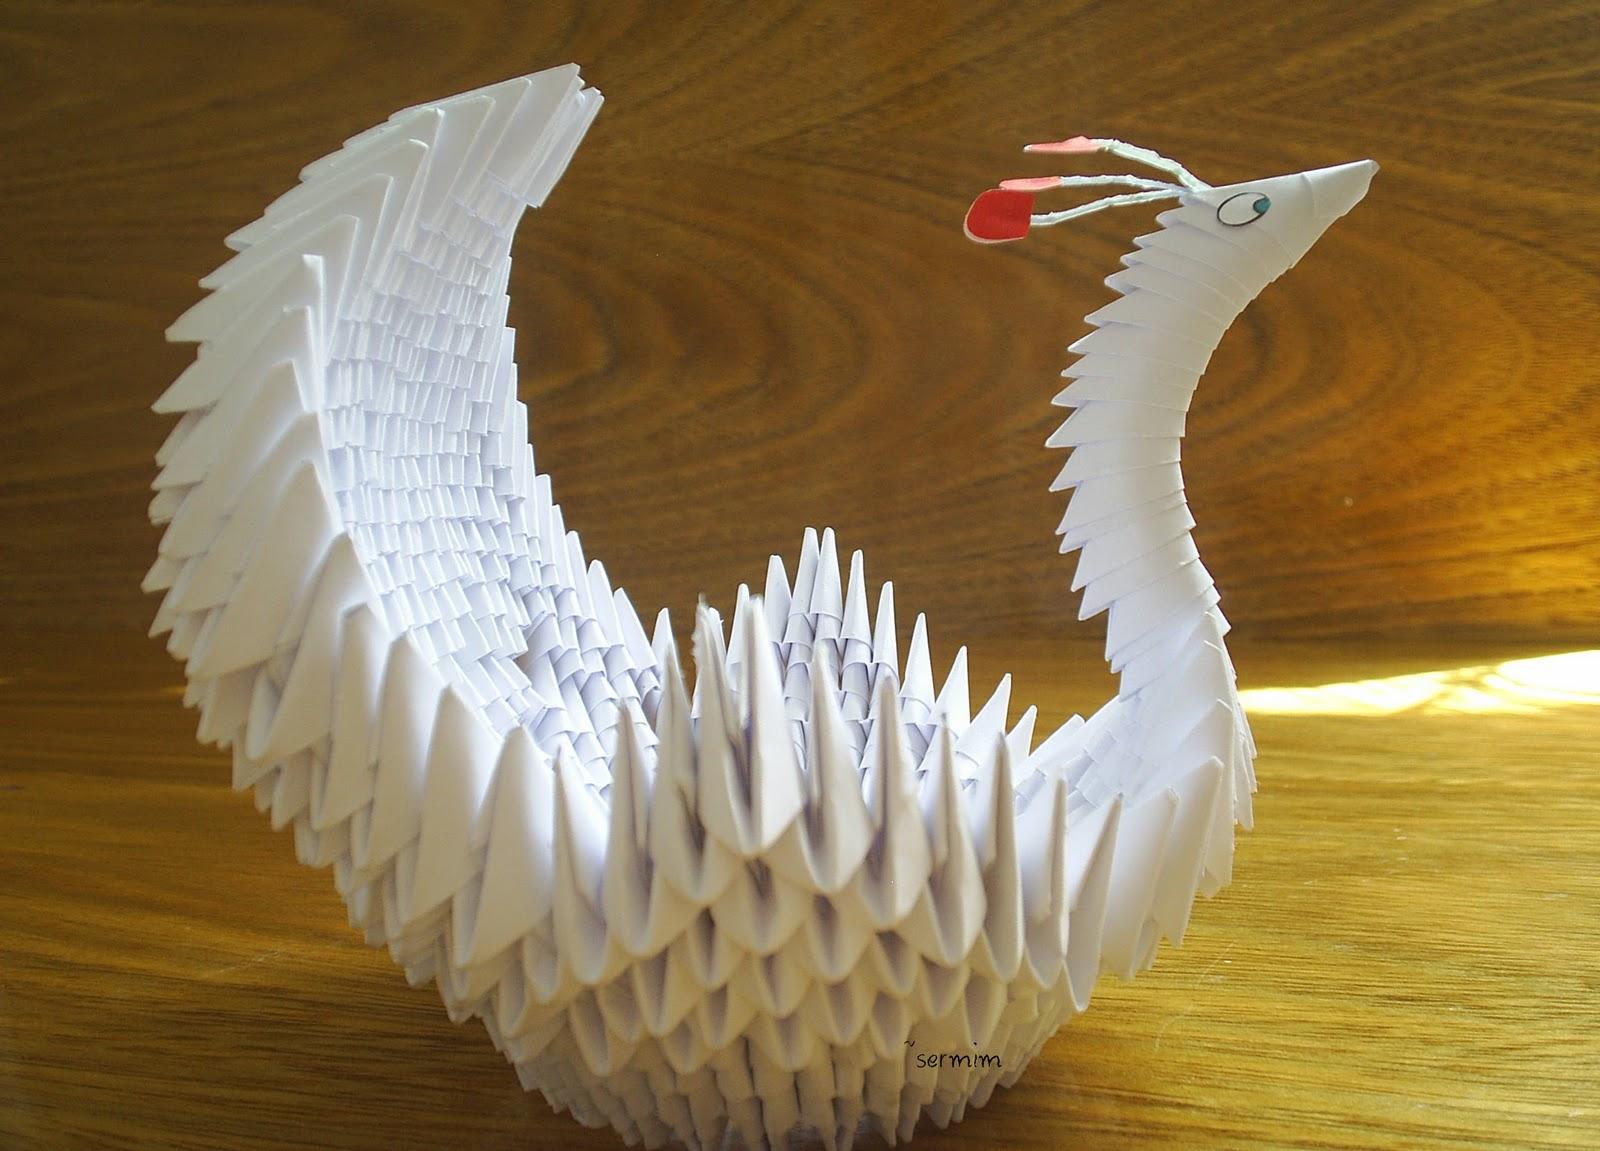 Fifteen Outstanding Origami Paper Art Pictures